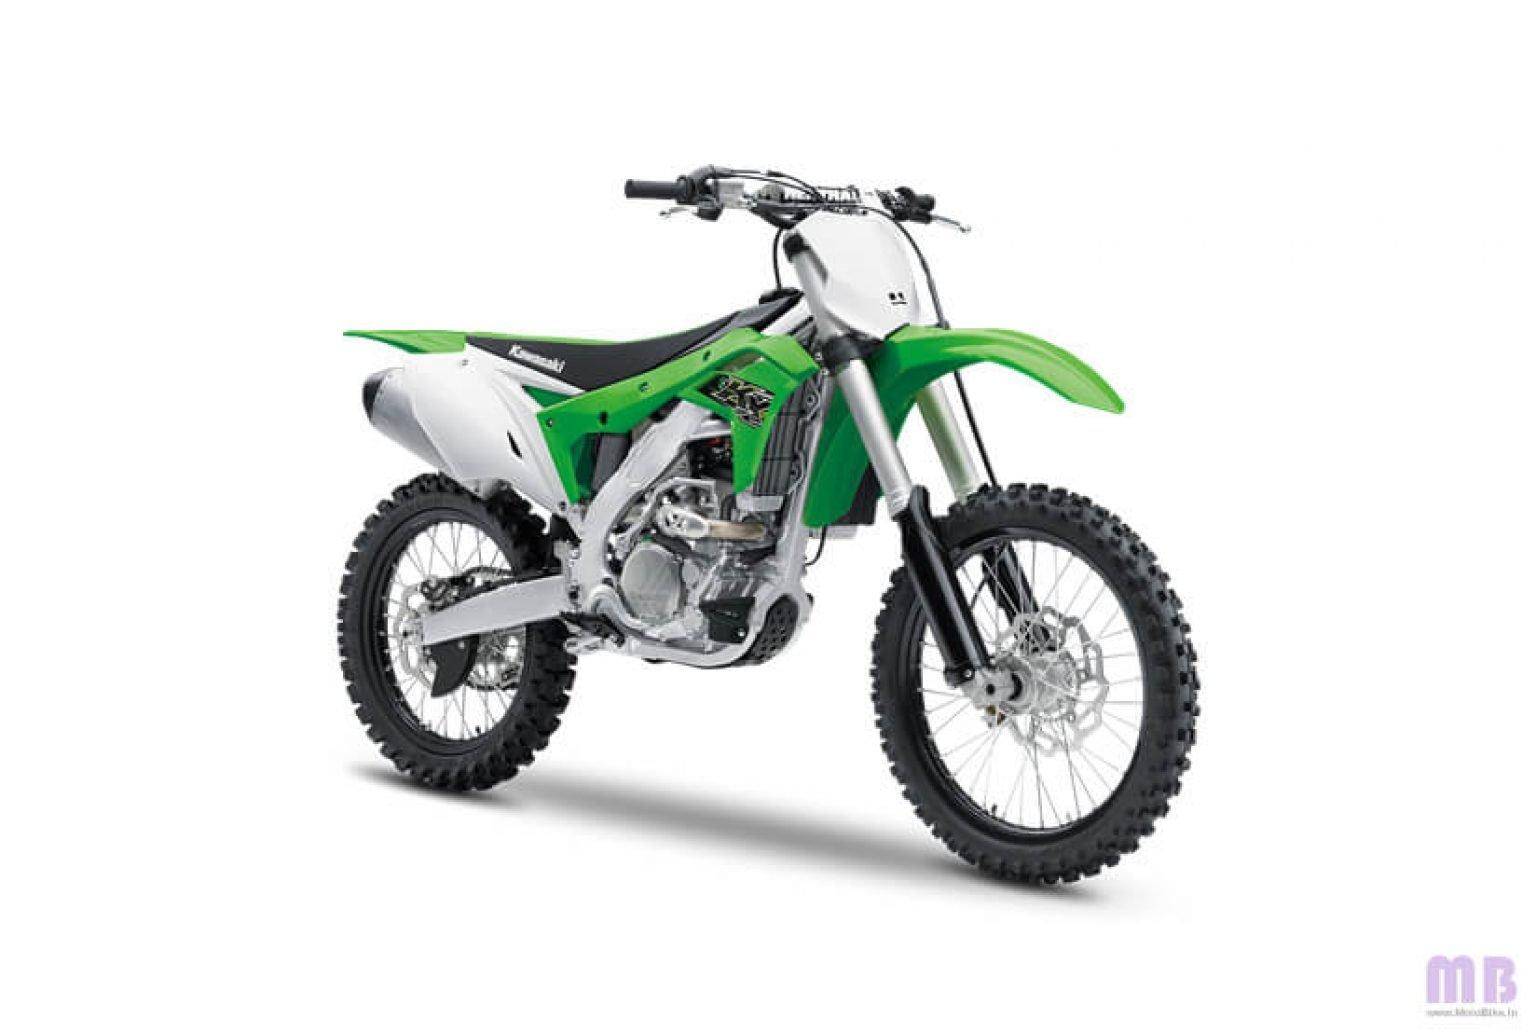 Kawasaki KX 250 Estimated Price, Specs, Mileage, Colours